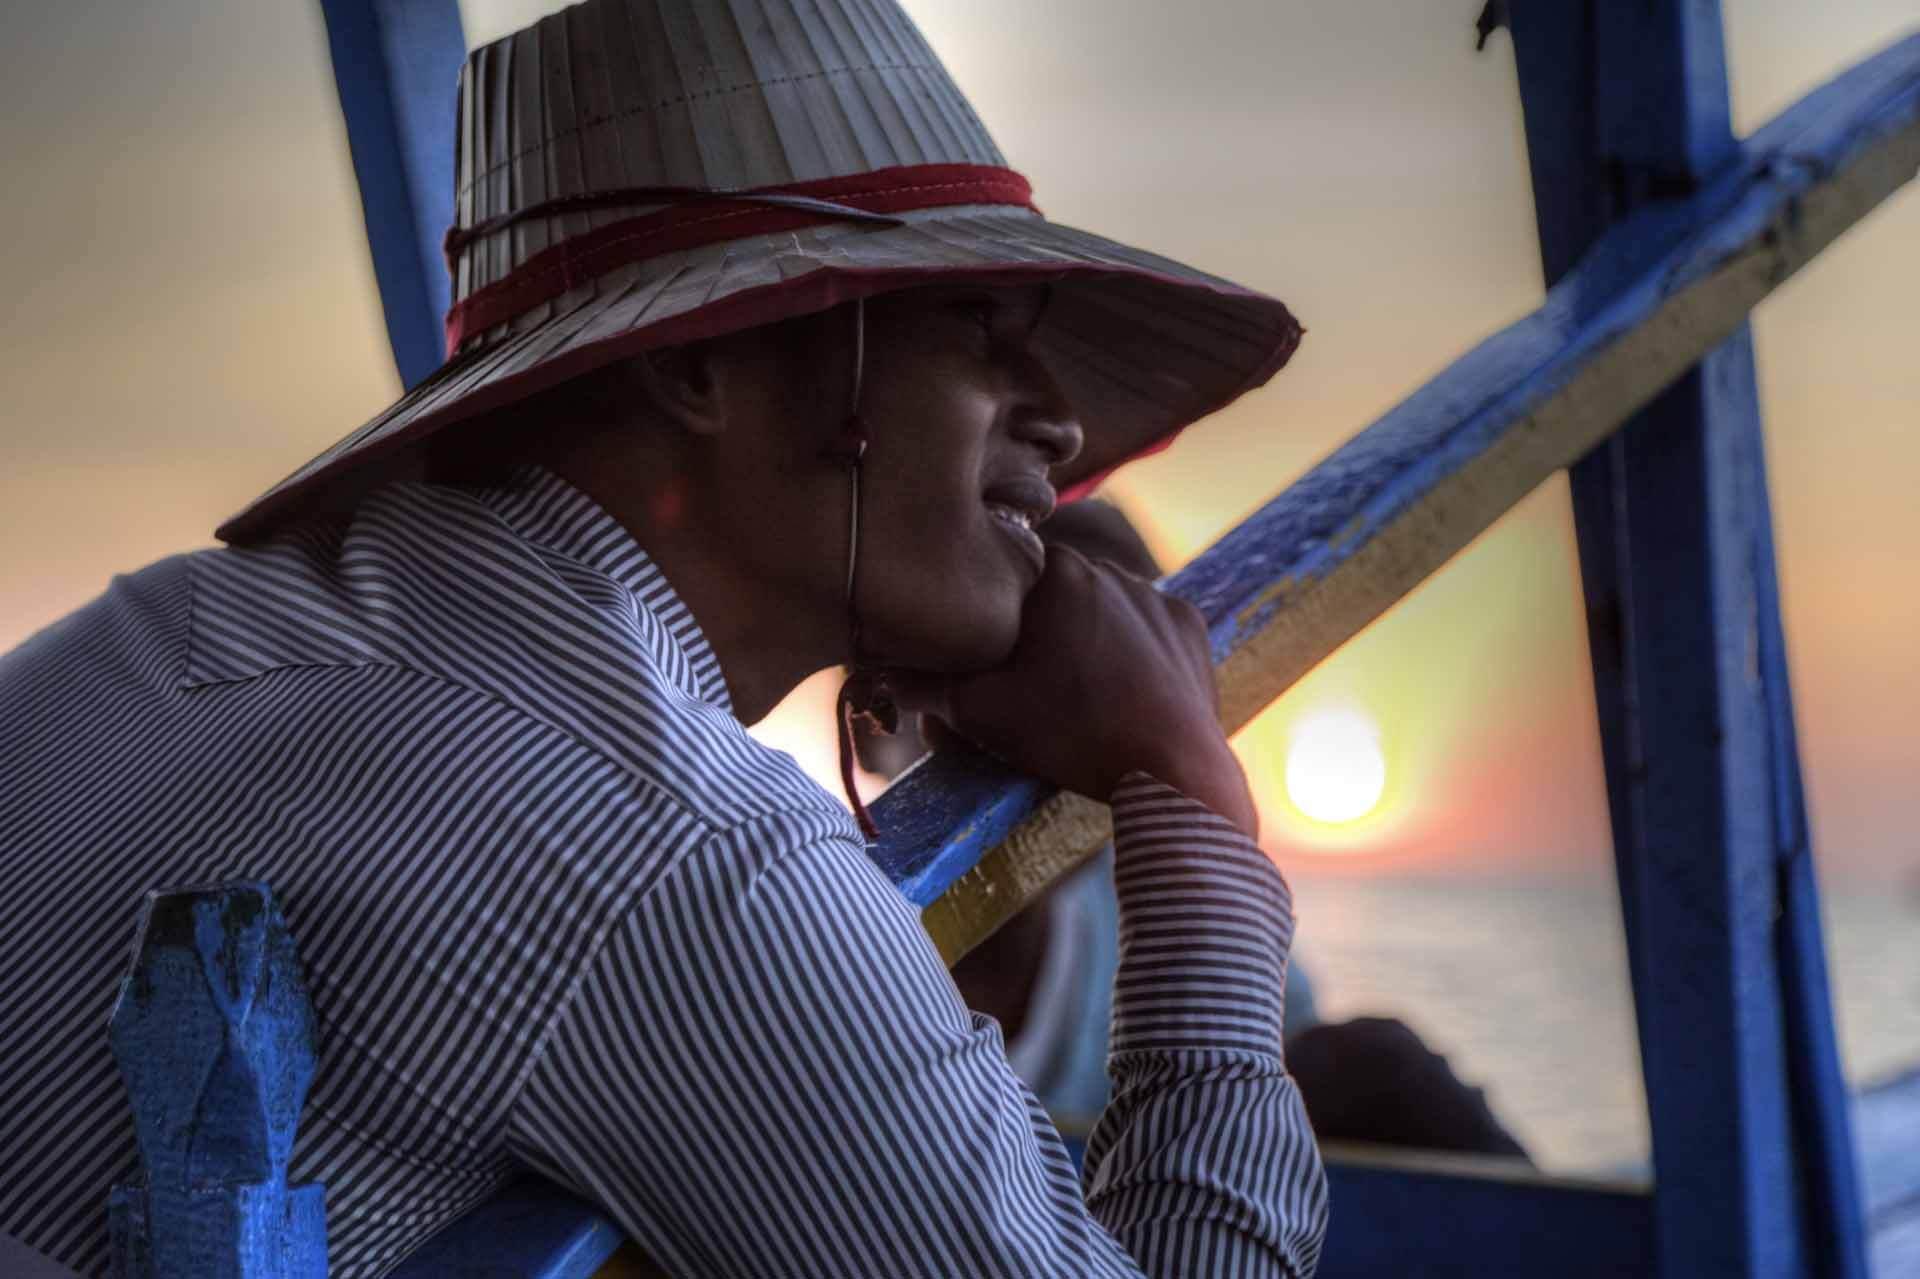 Bootsmann geniesst den Sonnenuntergang auf dem Tonle-Sap-See in Kambodscha